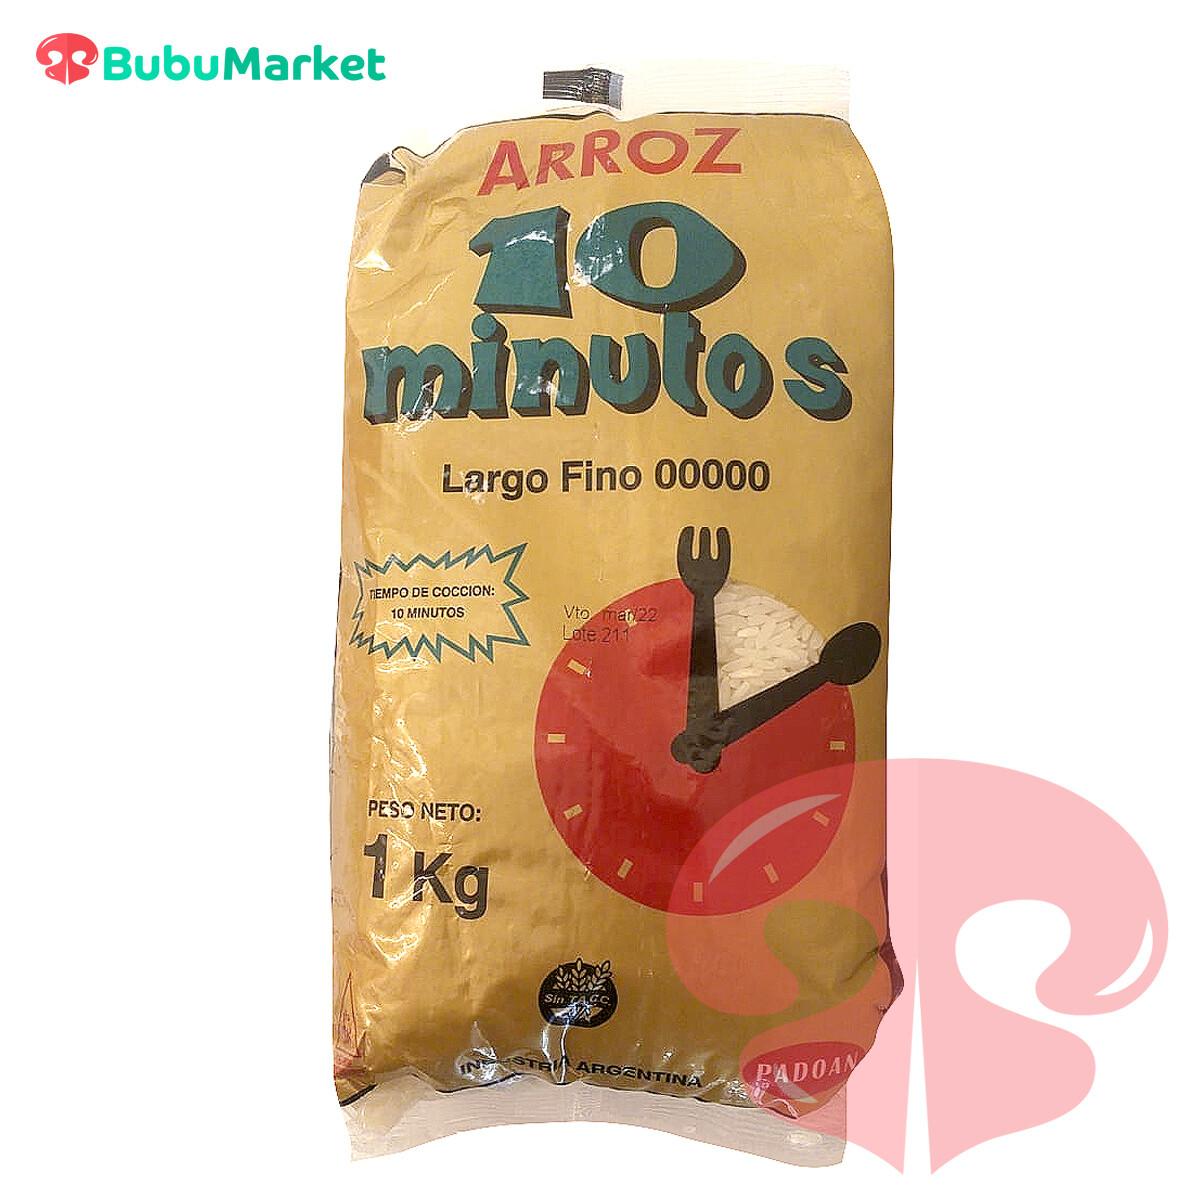 ARROZ 10 MINUTOS BOLSA DE 1 KILO